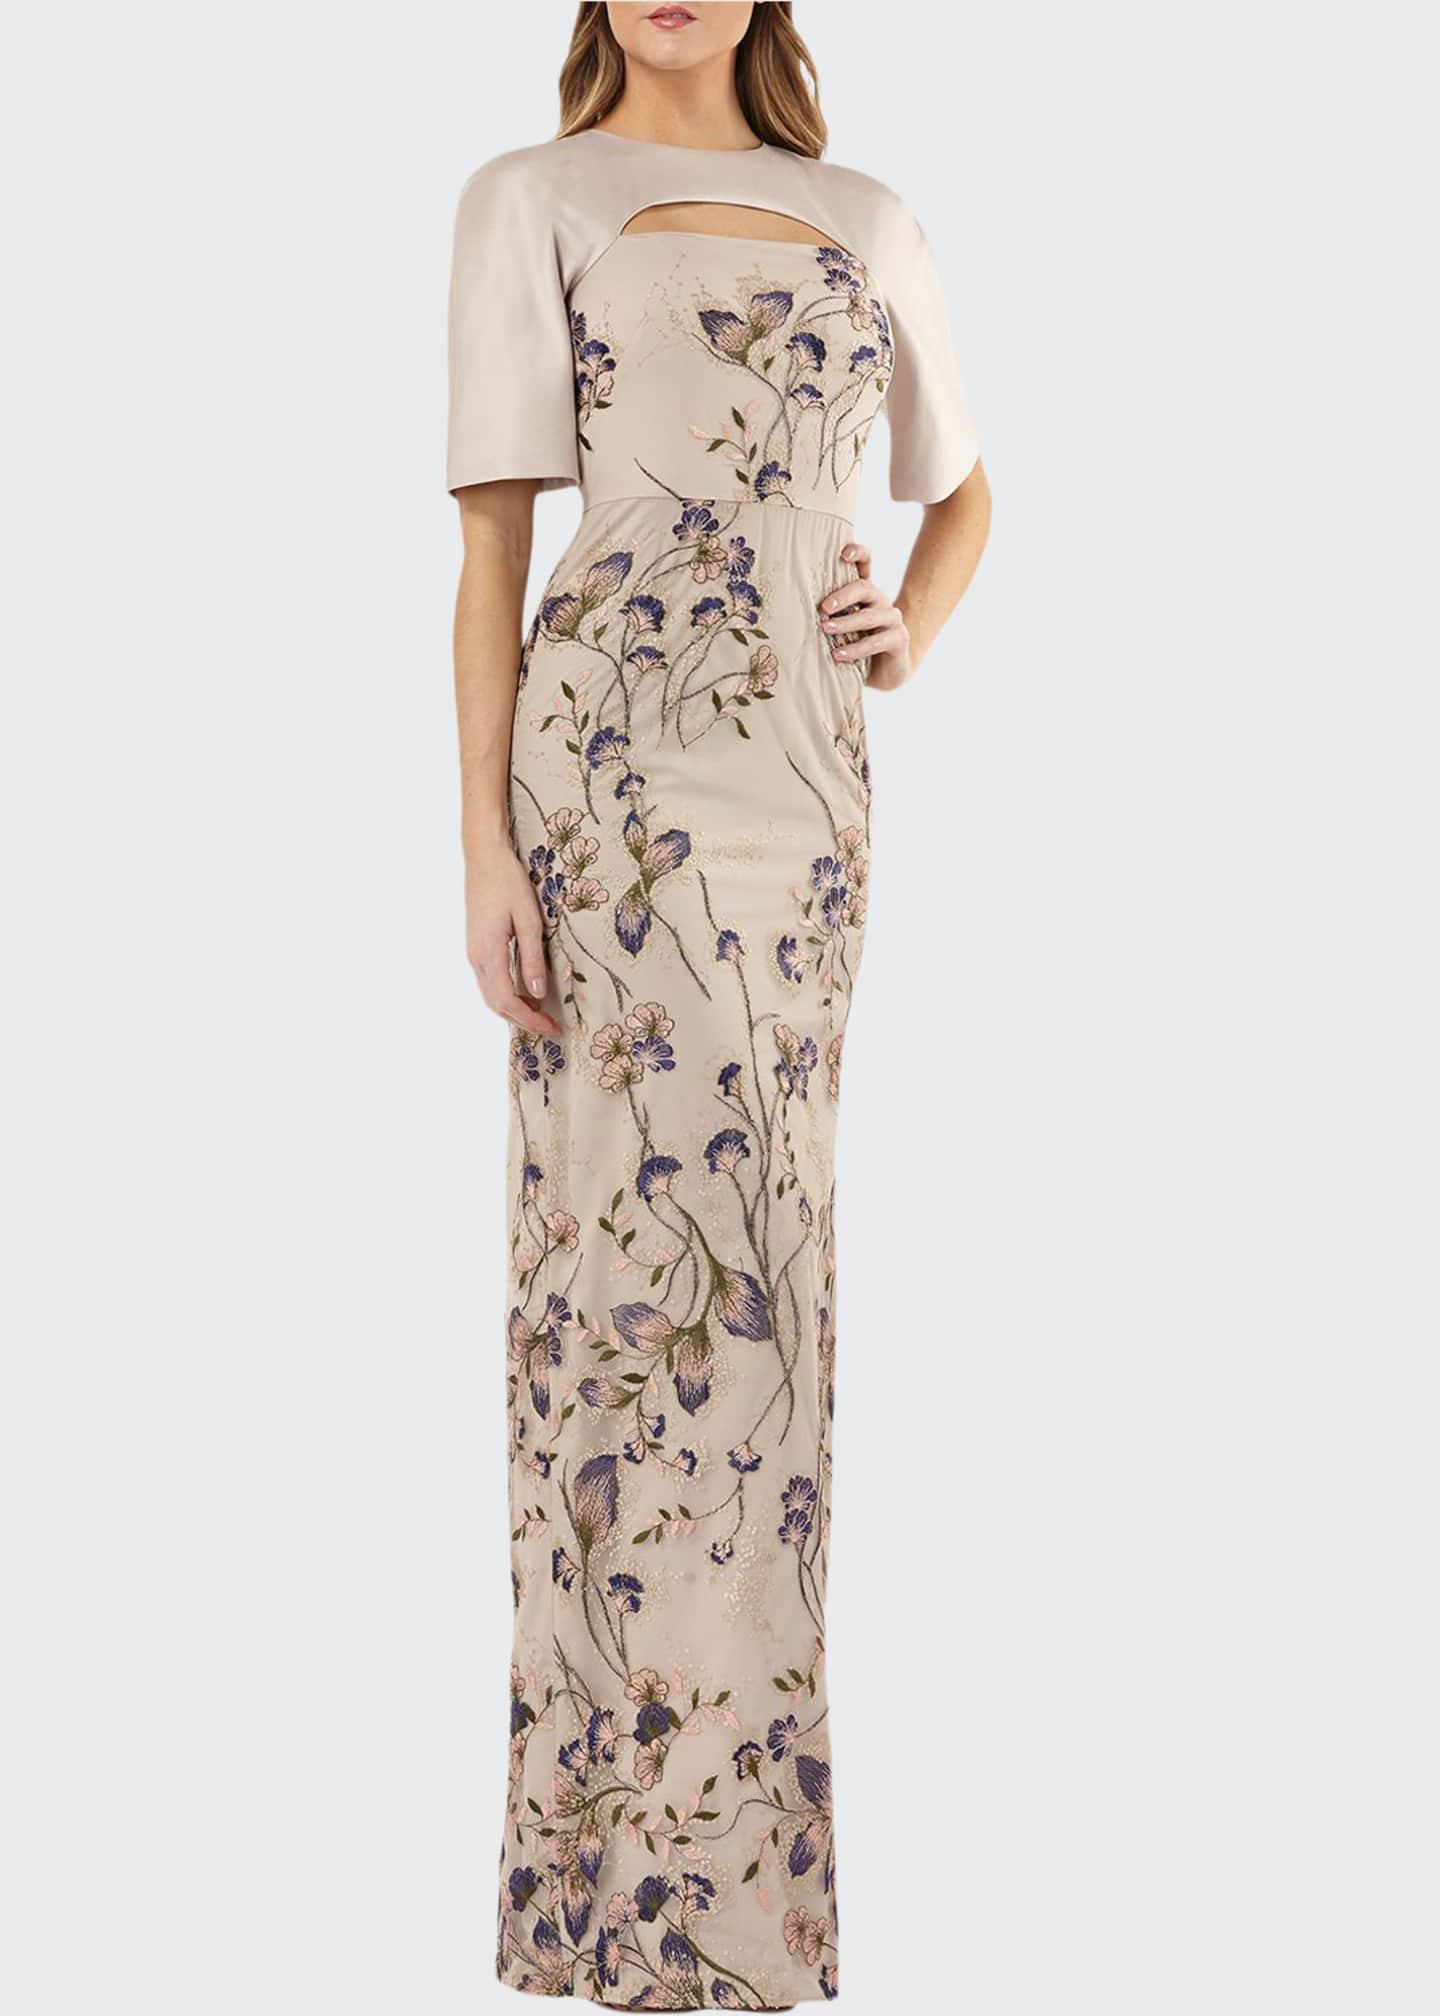 Kay Unger New York Cutout Mikado & Lace